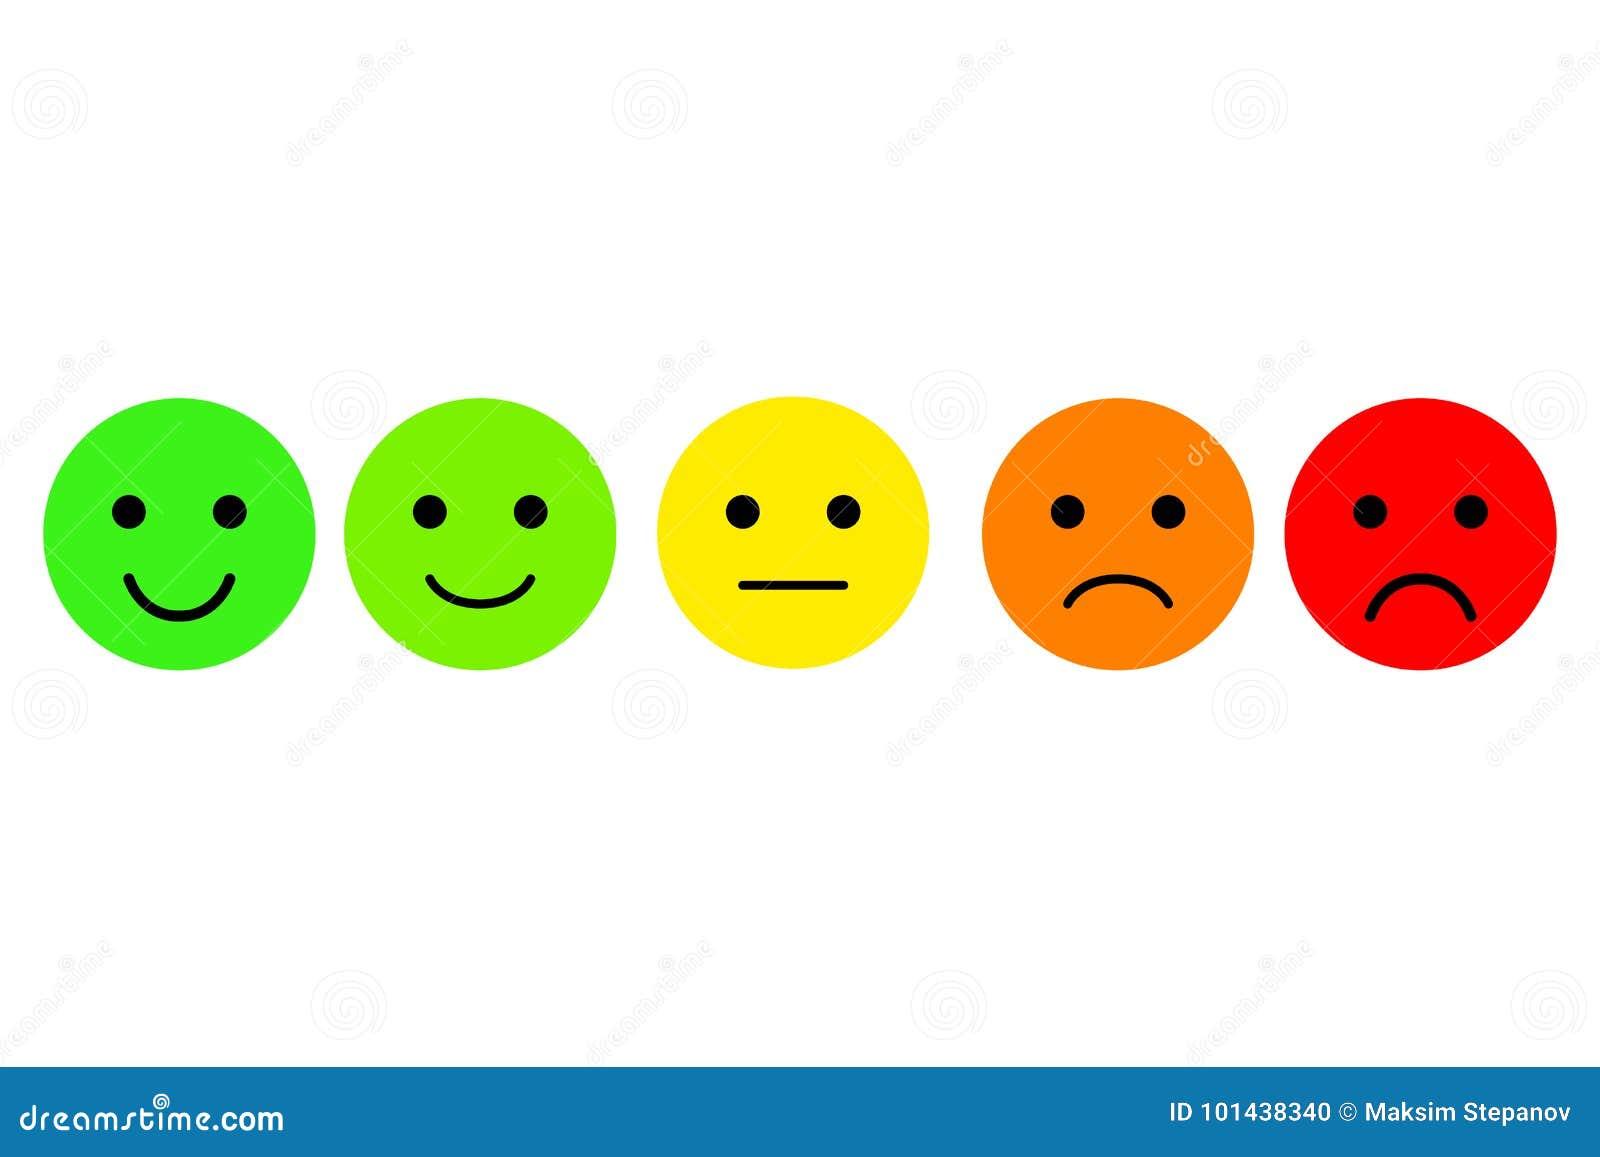 Resultado de imagem para tell your answer in smileys and ... |Grades Faces Emoji Answer